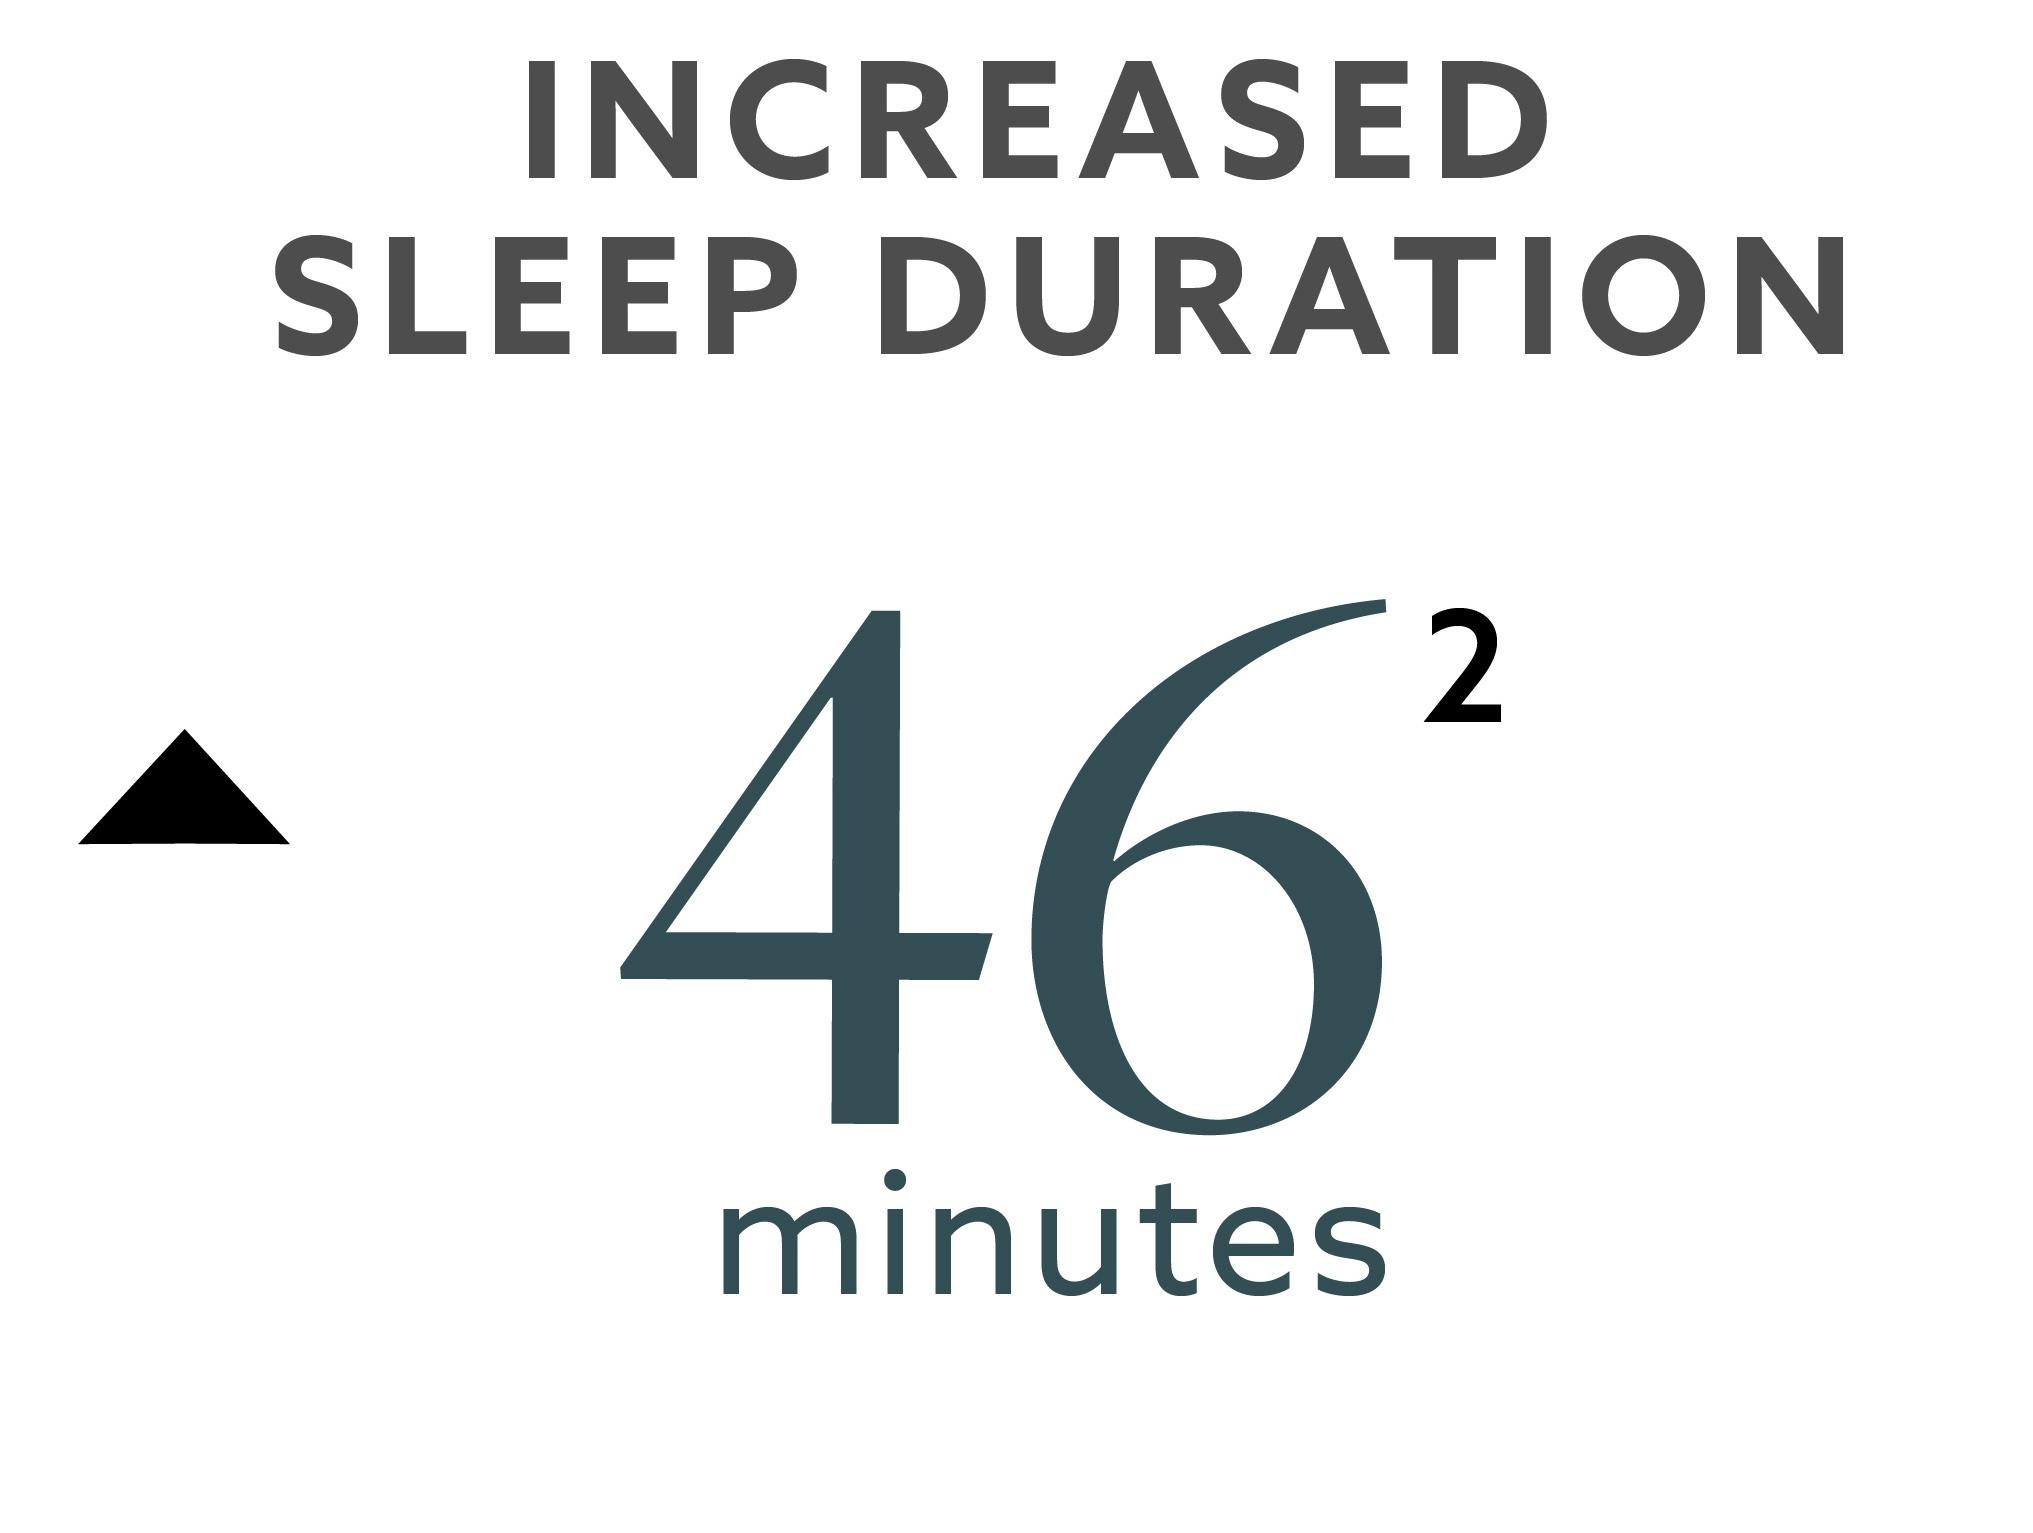 Increased Sleep Duration